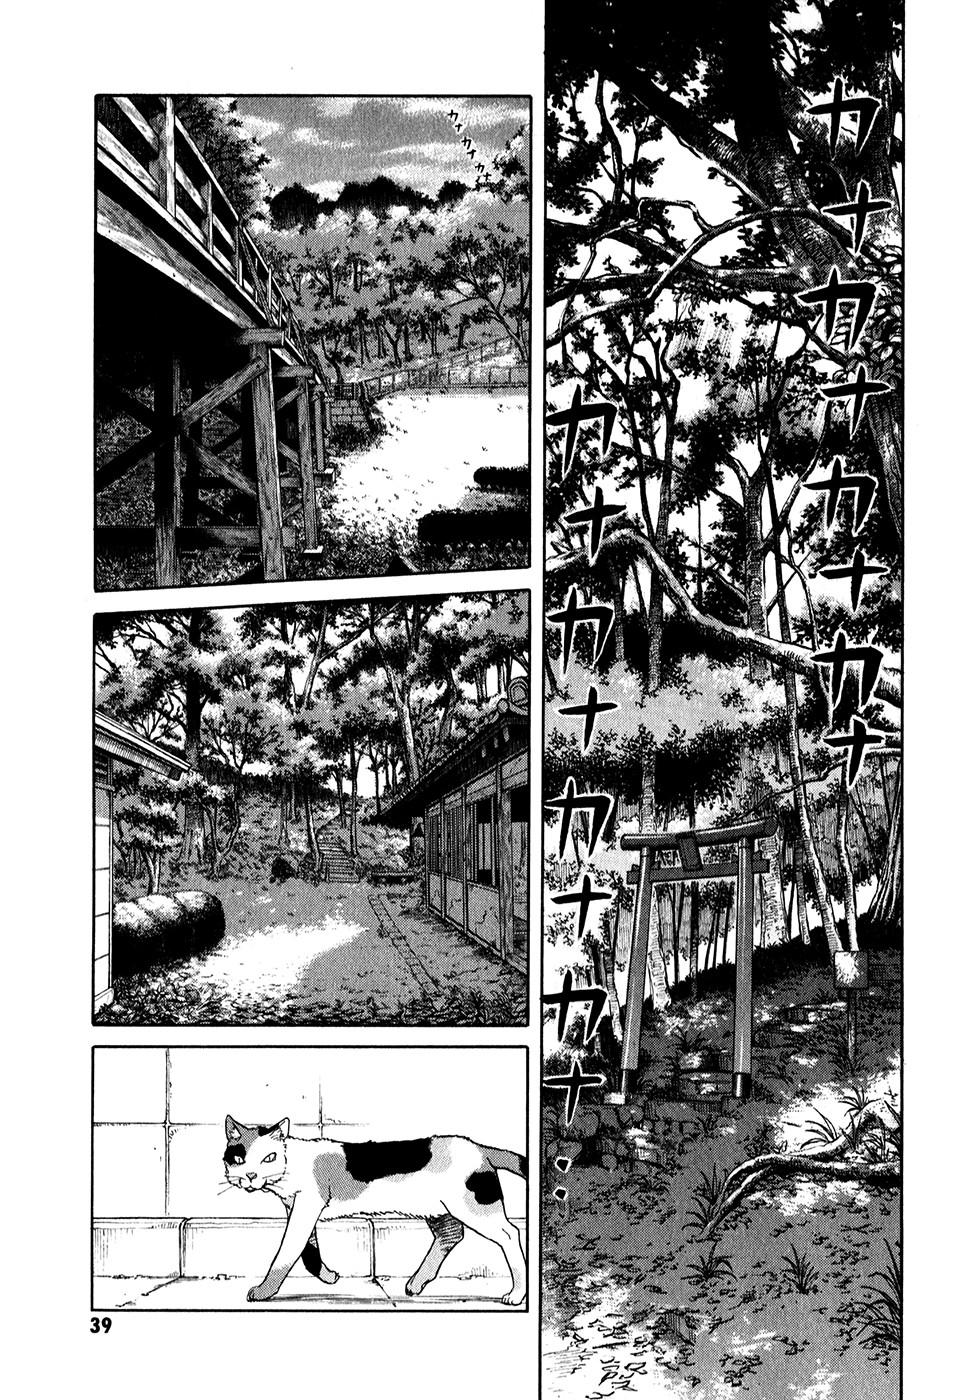 https://r2.ninemanga.com/comics/pic4/34/38242/1365531/156021062142.jpg Page 3